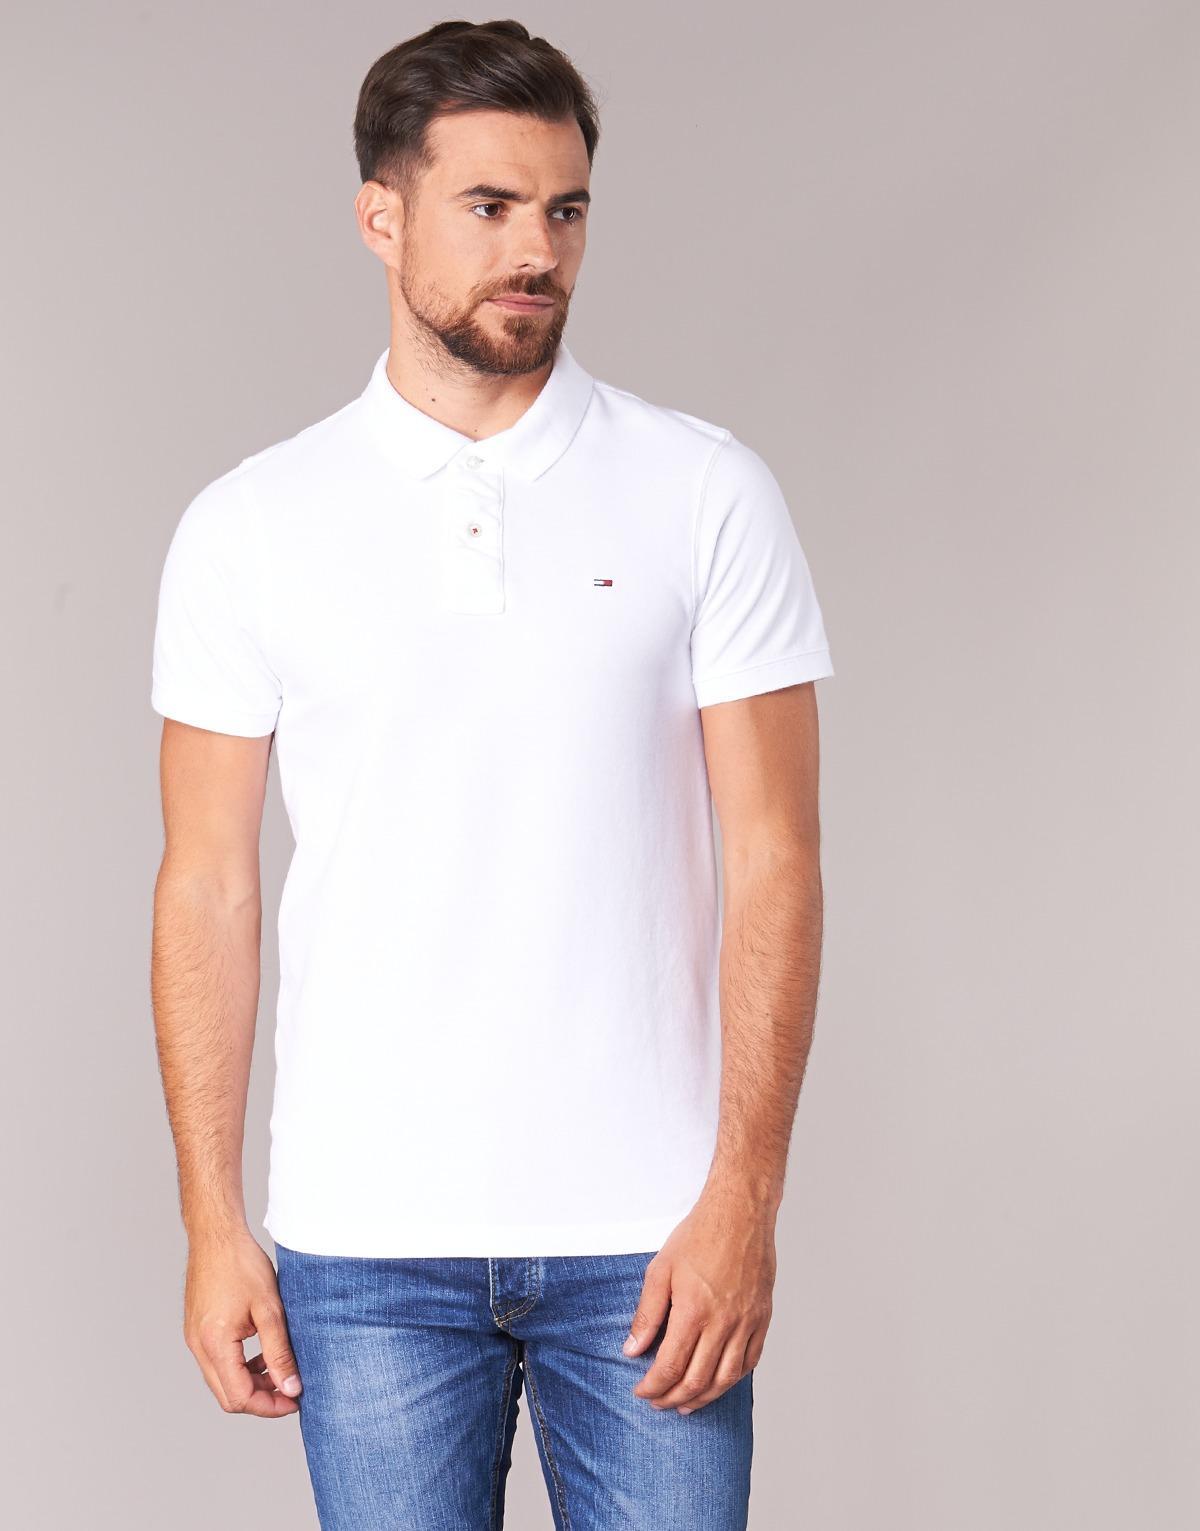 409f37e8 Tommy Hilfiger Original Flag Polo Men's Polo Shirt In White in White for  Men - Lyst